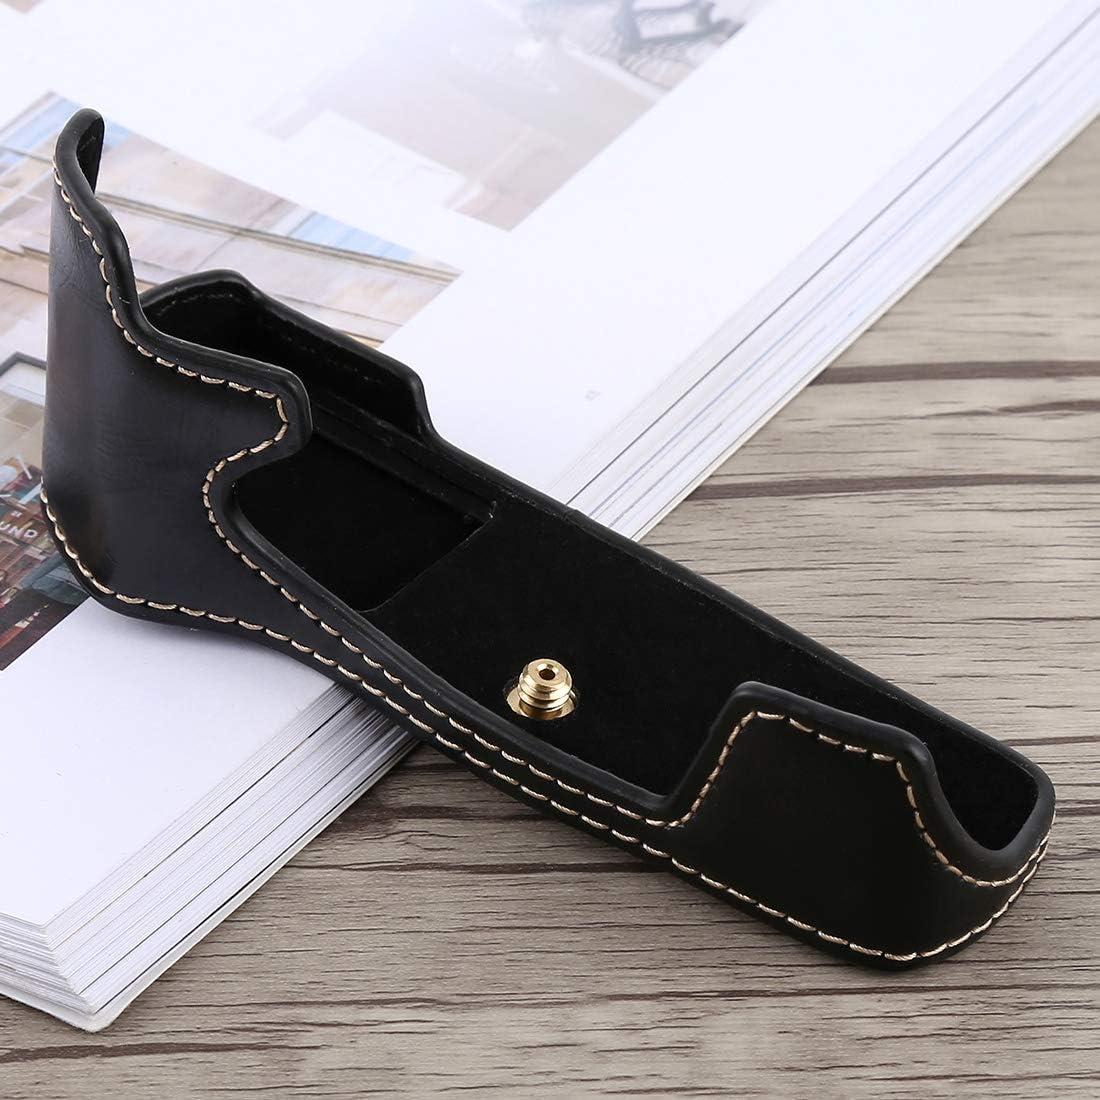 EM5 Mark II Black Color : Black YANTAIANJANE Camera Accessories 1//4 inch Thread PU Leather Camera Half Case Base for Olympus EM5